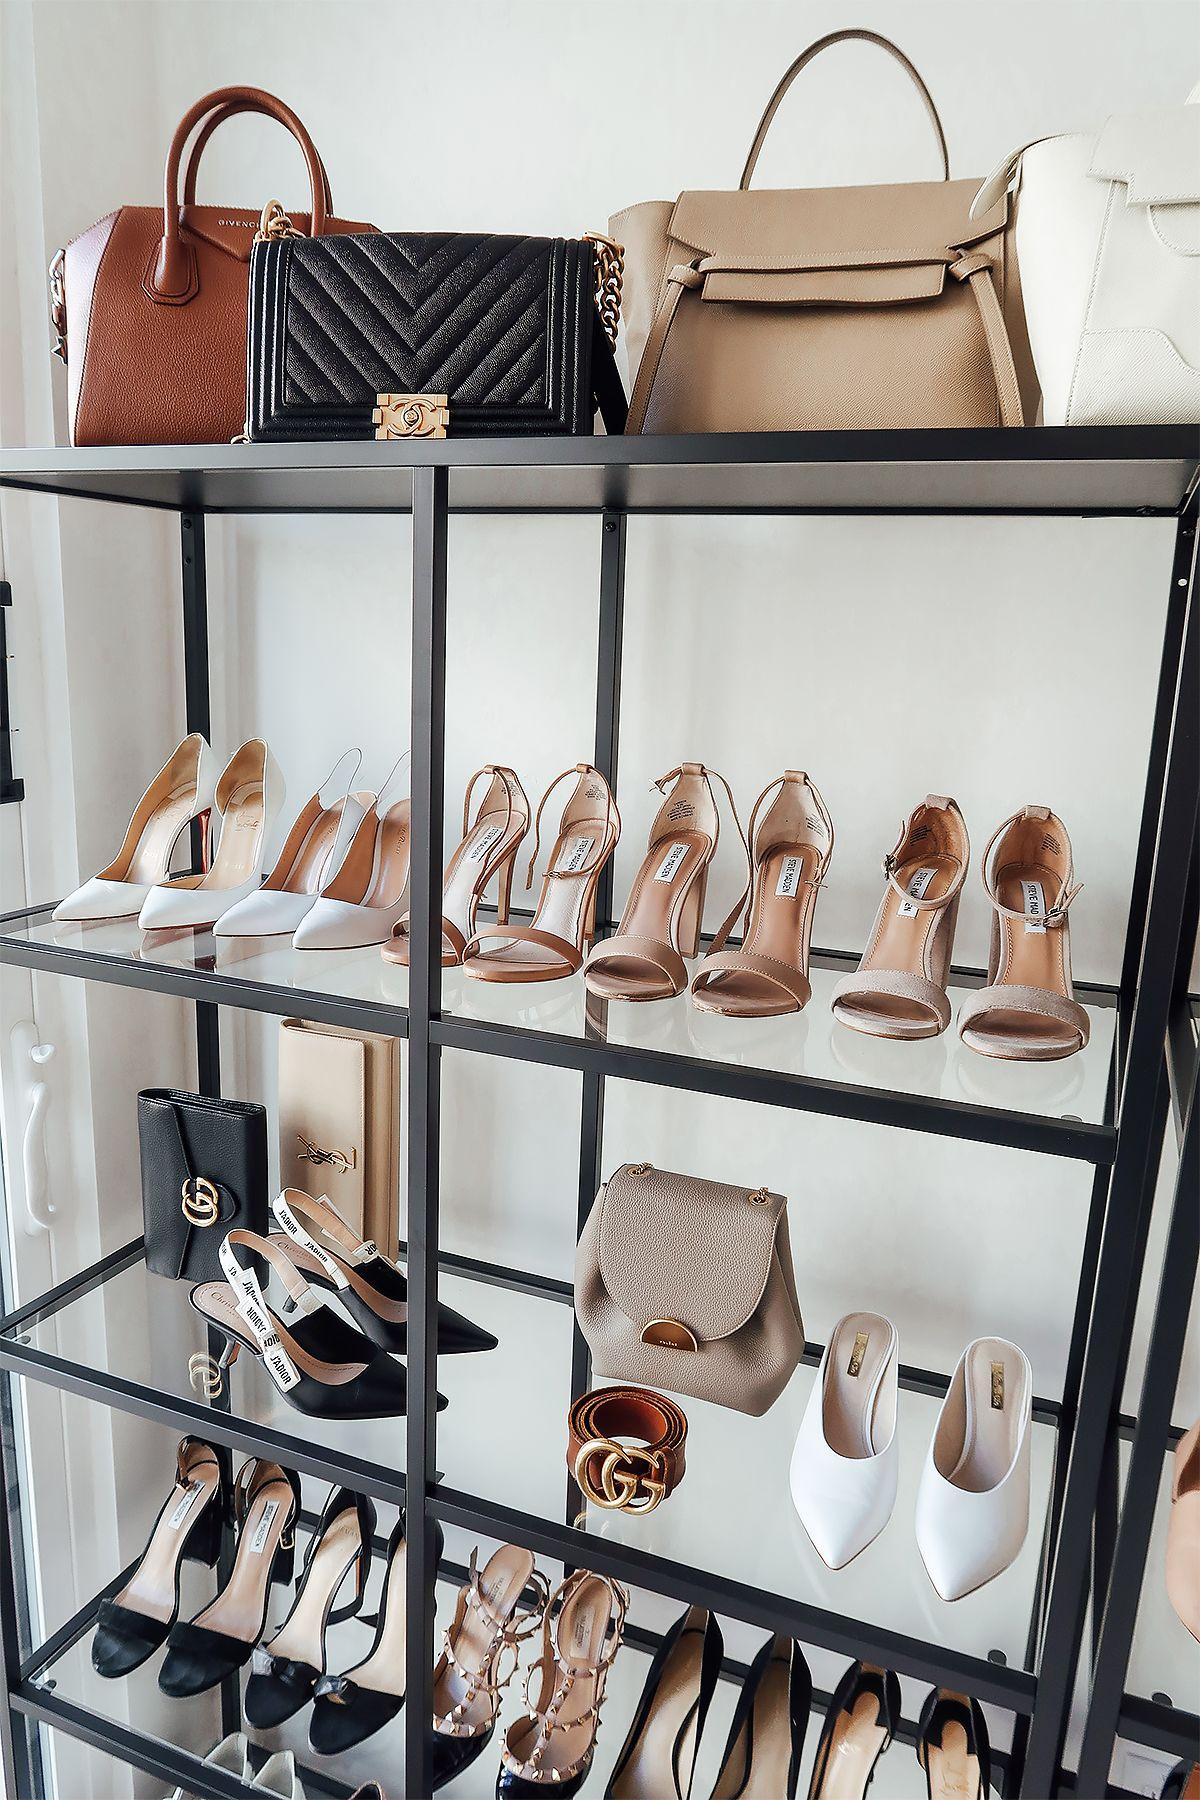 My Handbag Shoe Collection Bag Closet Closet Decor Shoe Collection